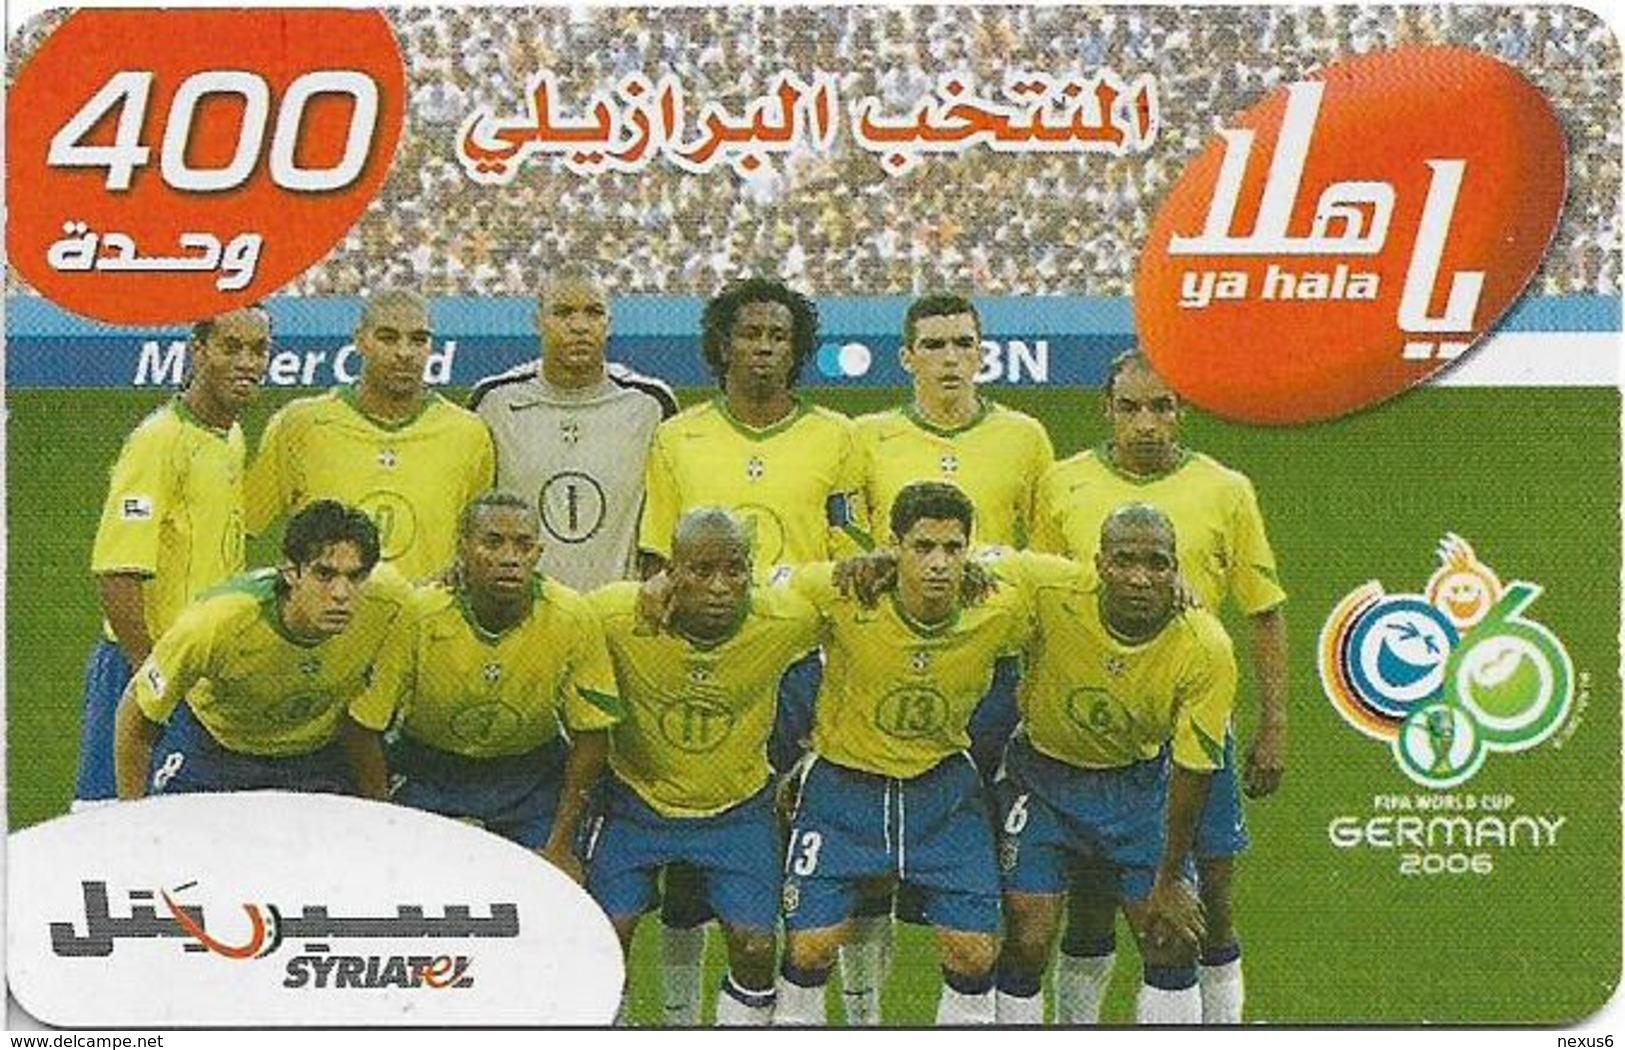 Syria - Syriatel - Football Teams Wrold Cup 2006 - Brazil, Exp. 31.12.2009, Prepaid 200U, Used - Syria